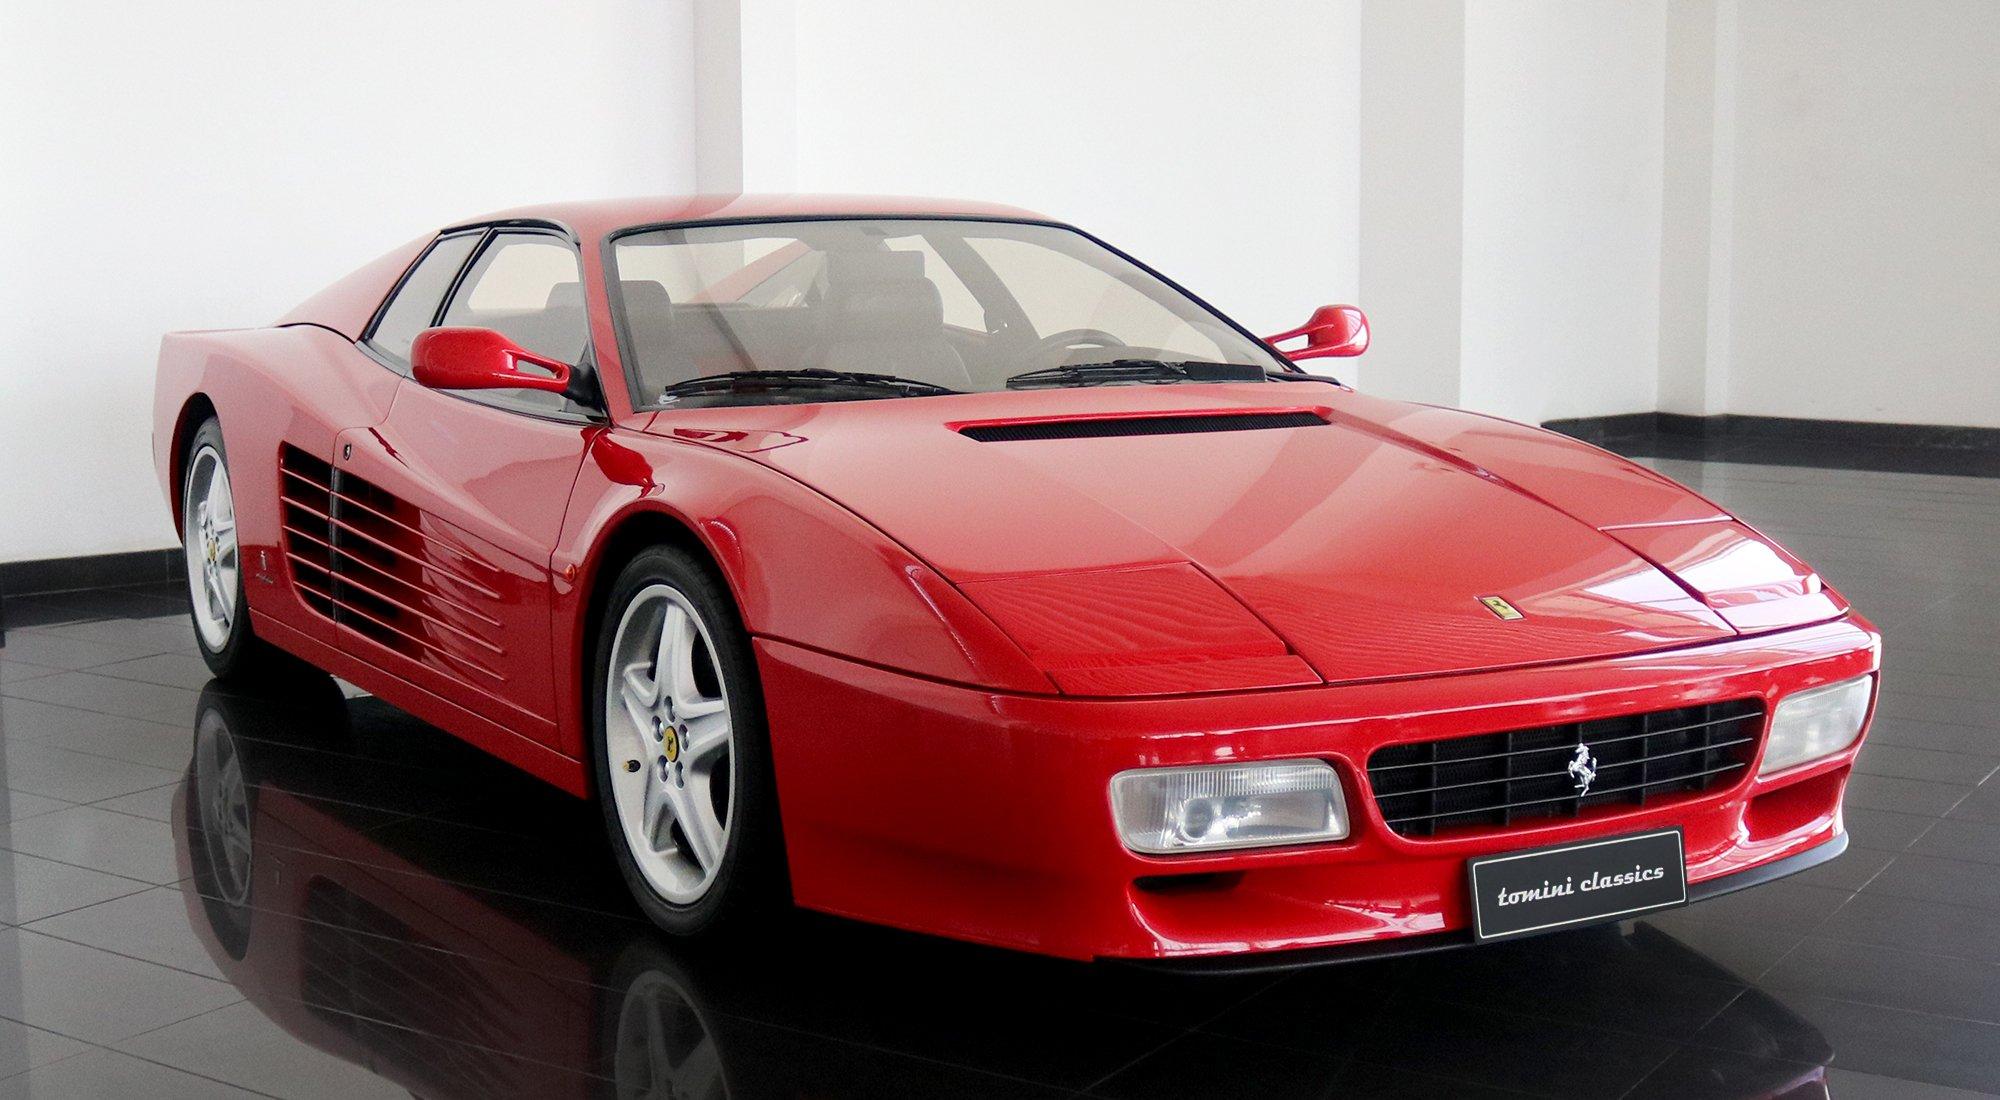 1992 Ferrari 512 Tr In Business Bay Dubai United Arab Emirates For Sale 10618742